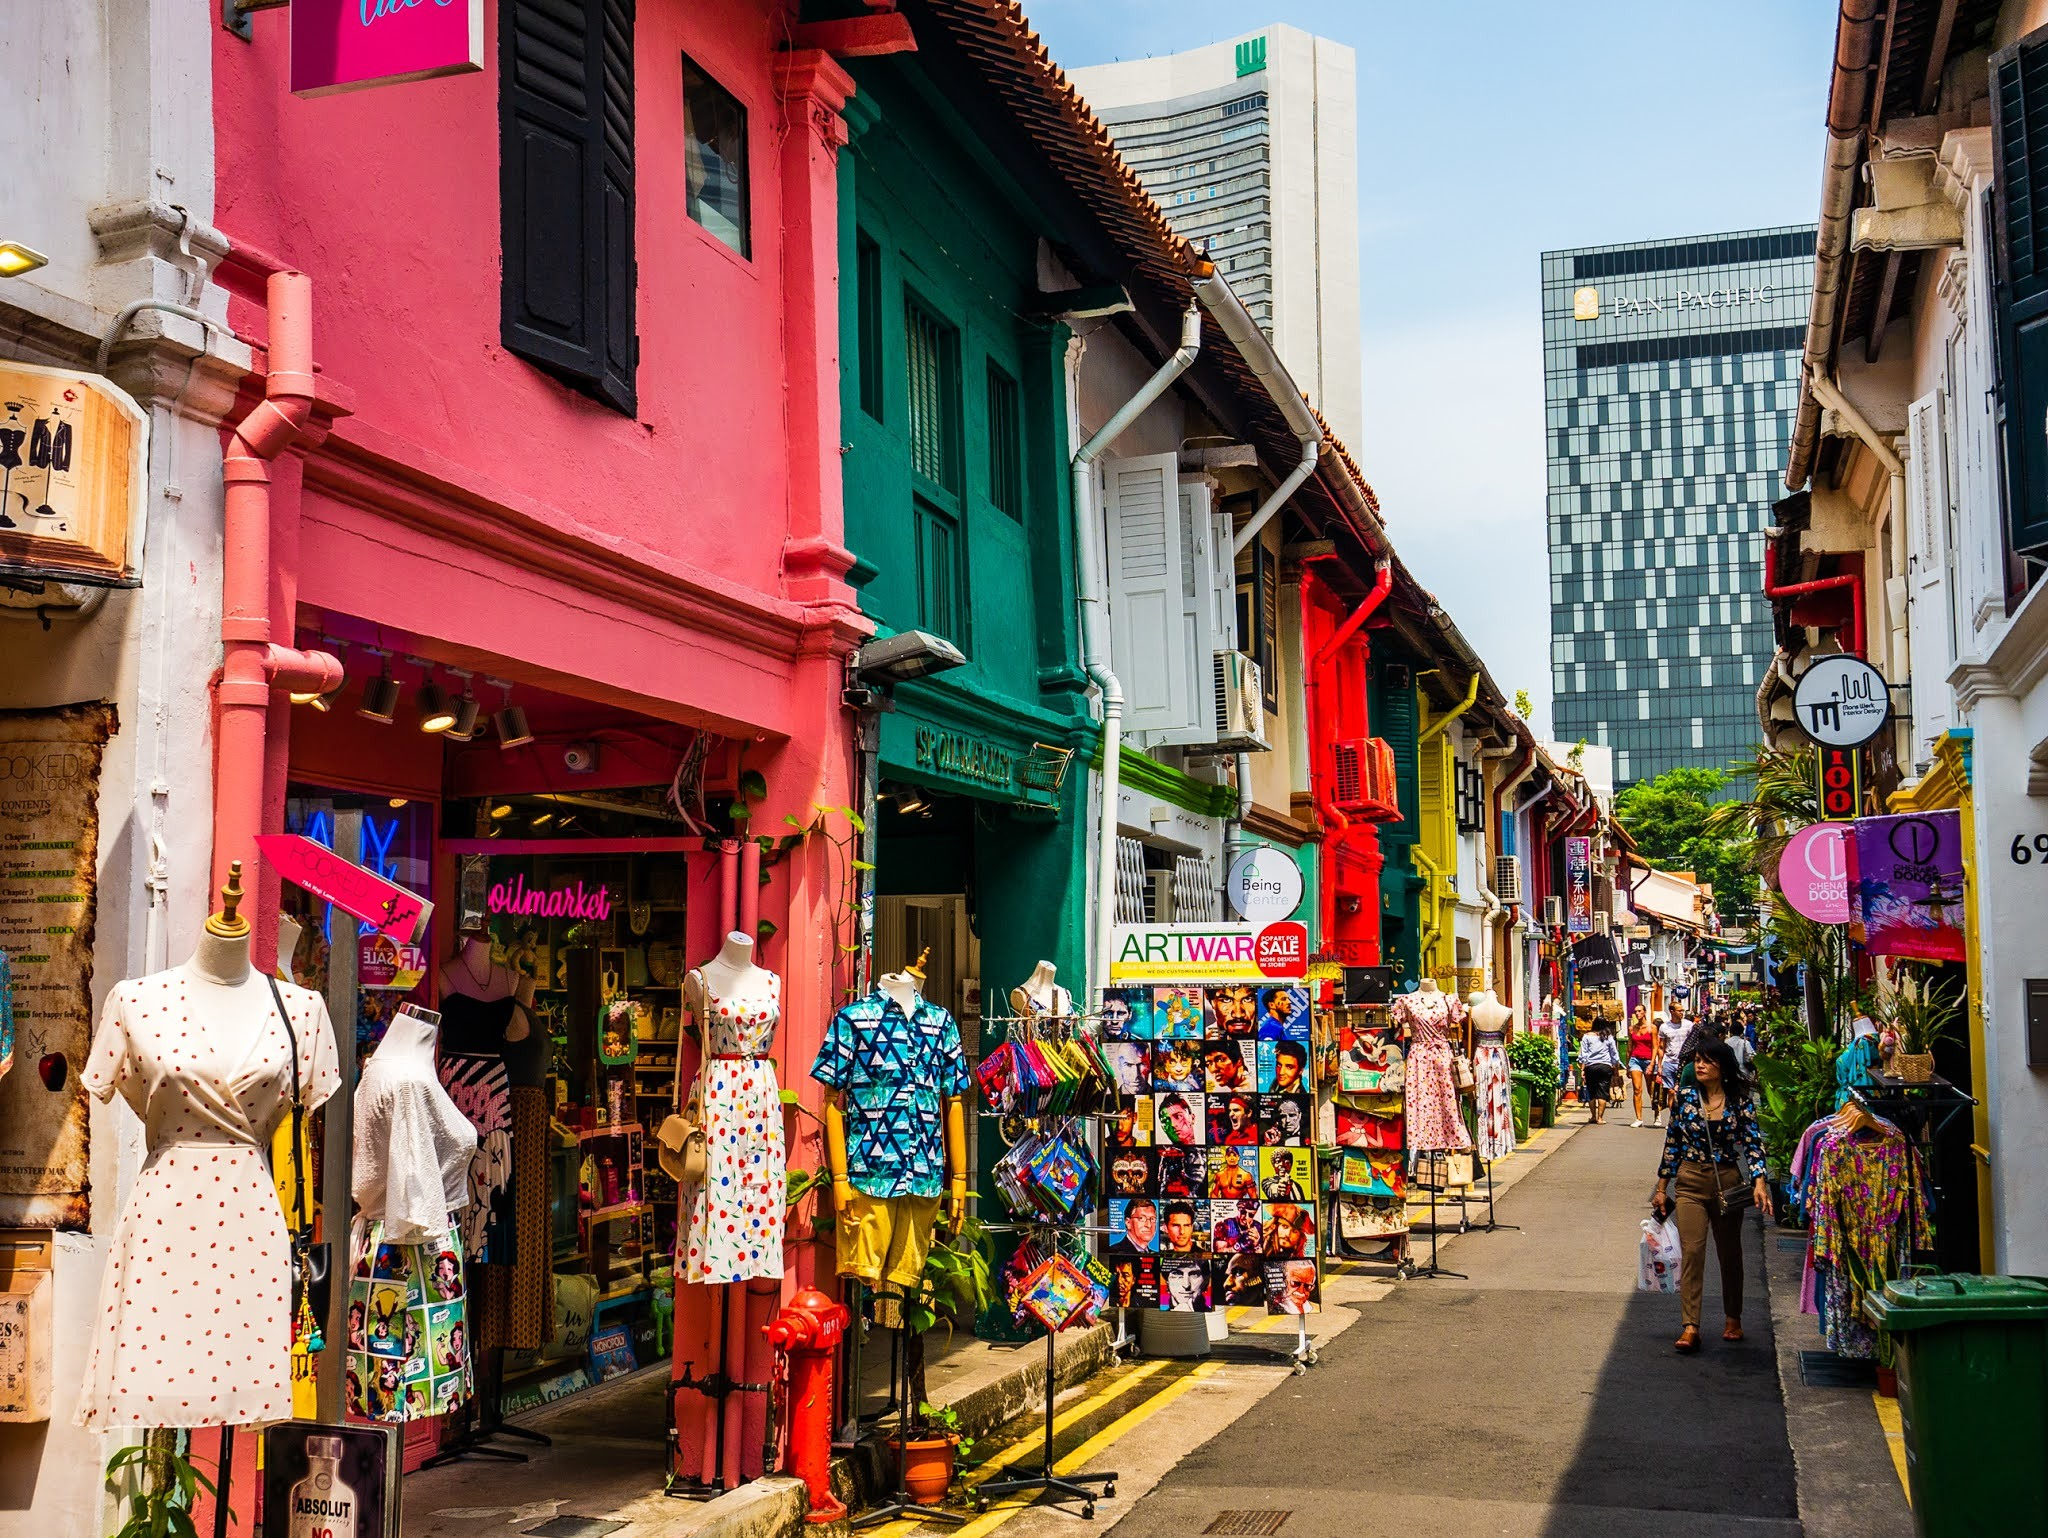 Bugis has been named one of the coolest neighbourhoods in the world